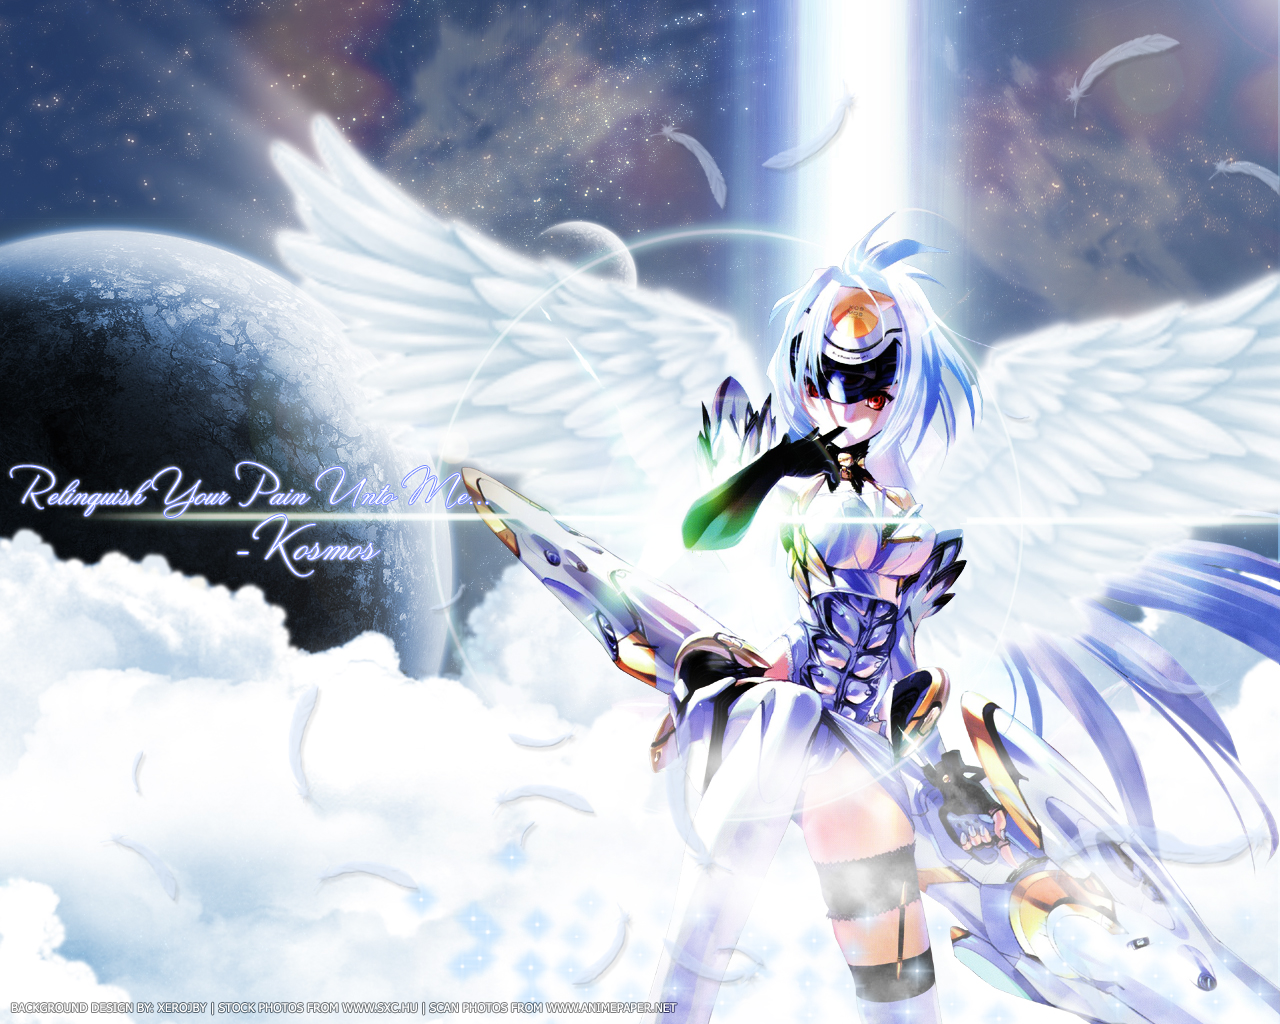 choco chocolate_shop kos-mos mechagirl planet wings xenosaga